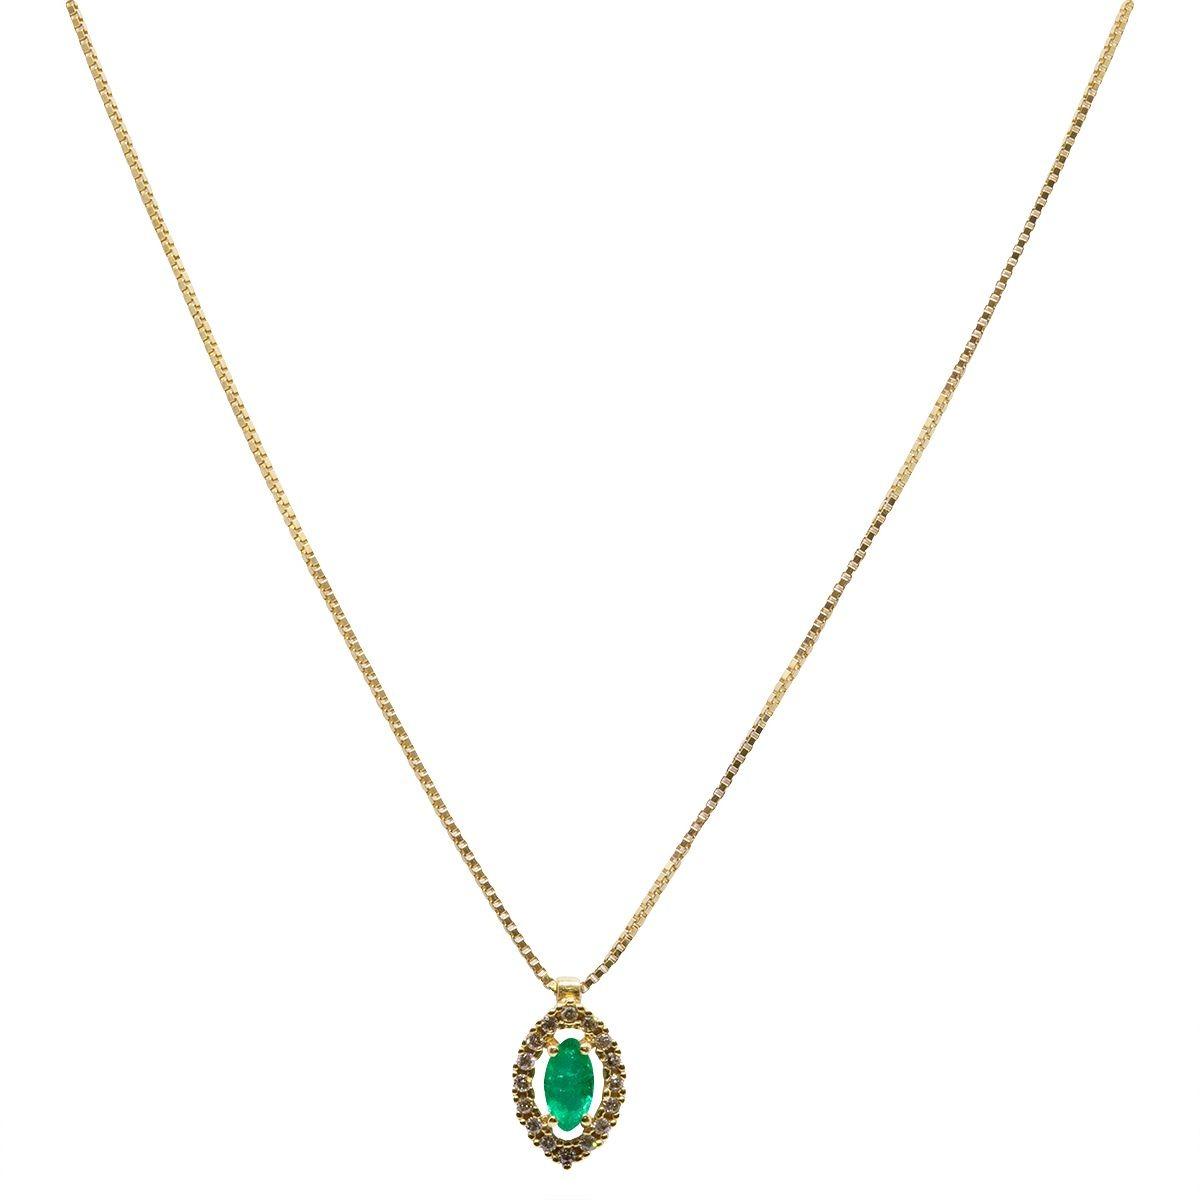 12d1d63bb3173 Gargantilha Ouro 18k Esmeralda E Diamante - R  1.650